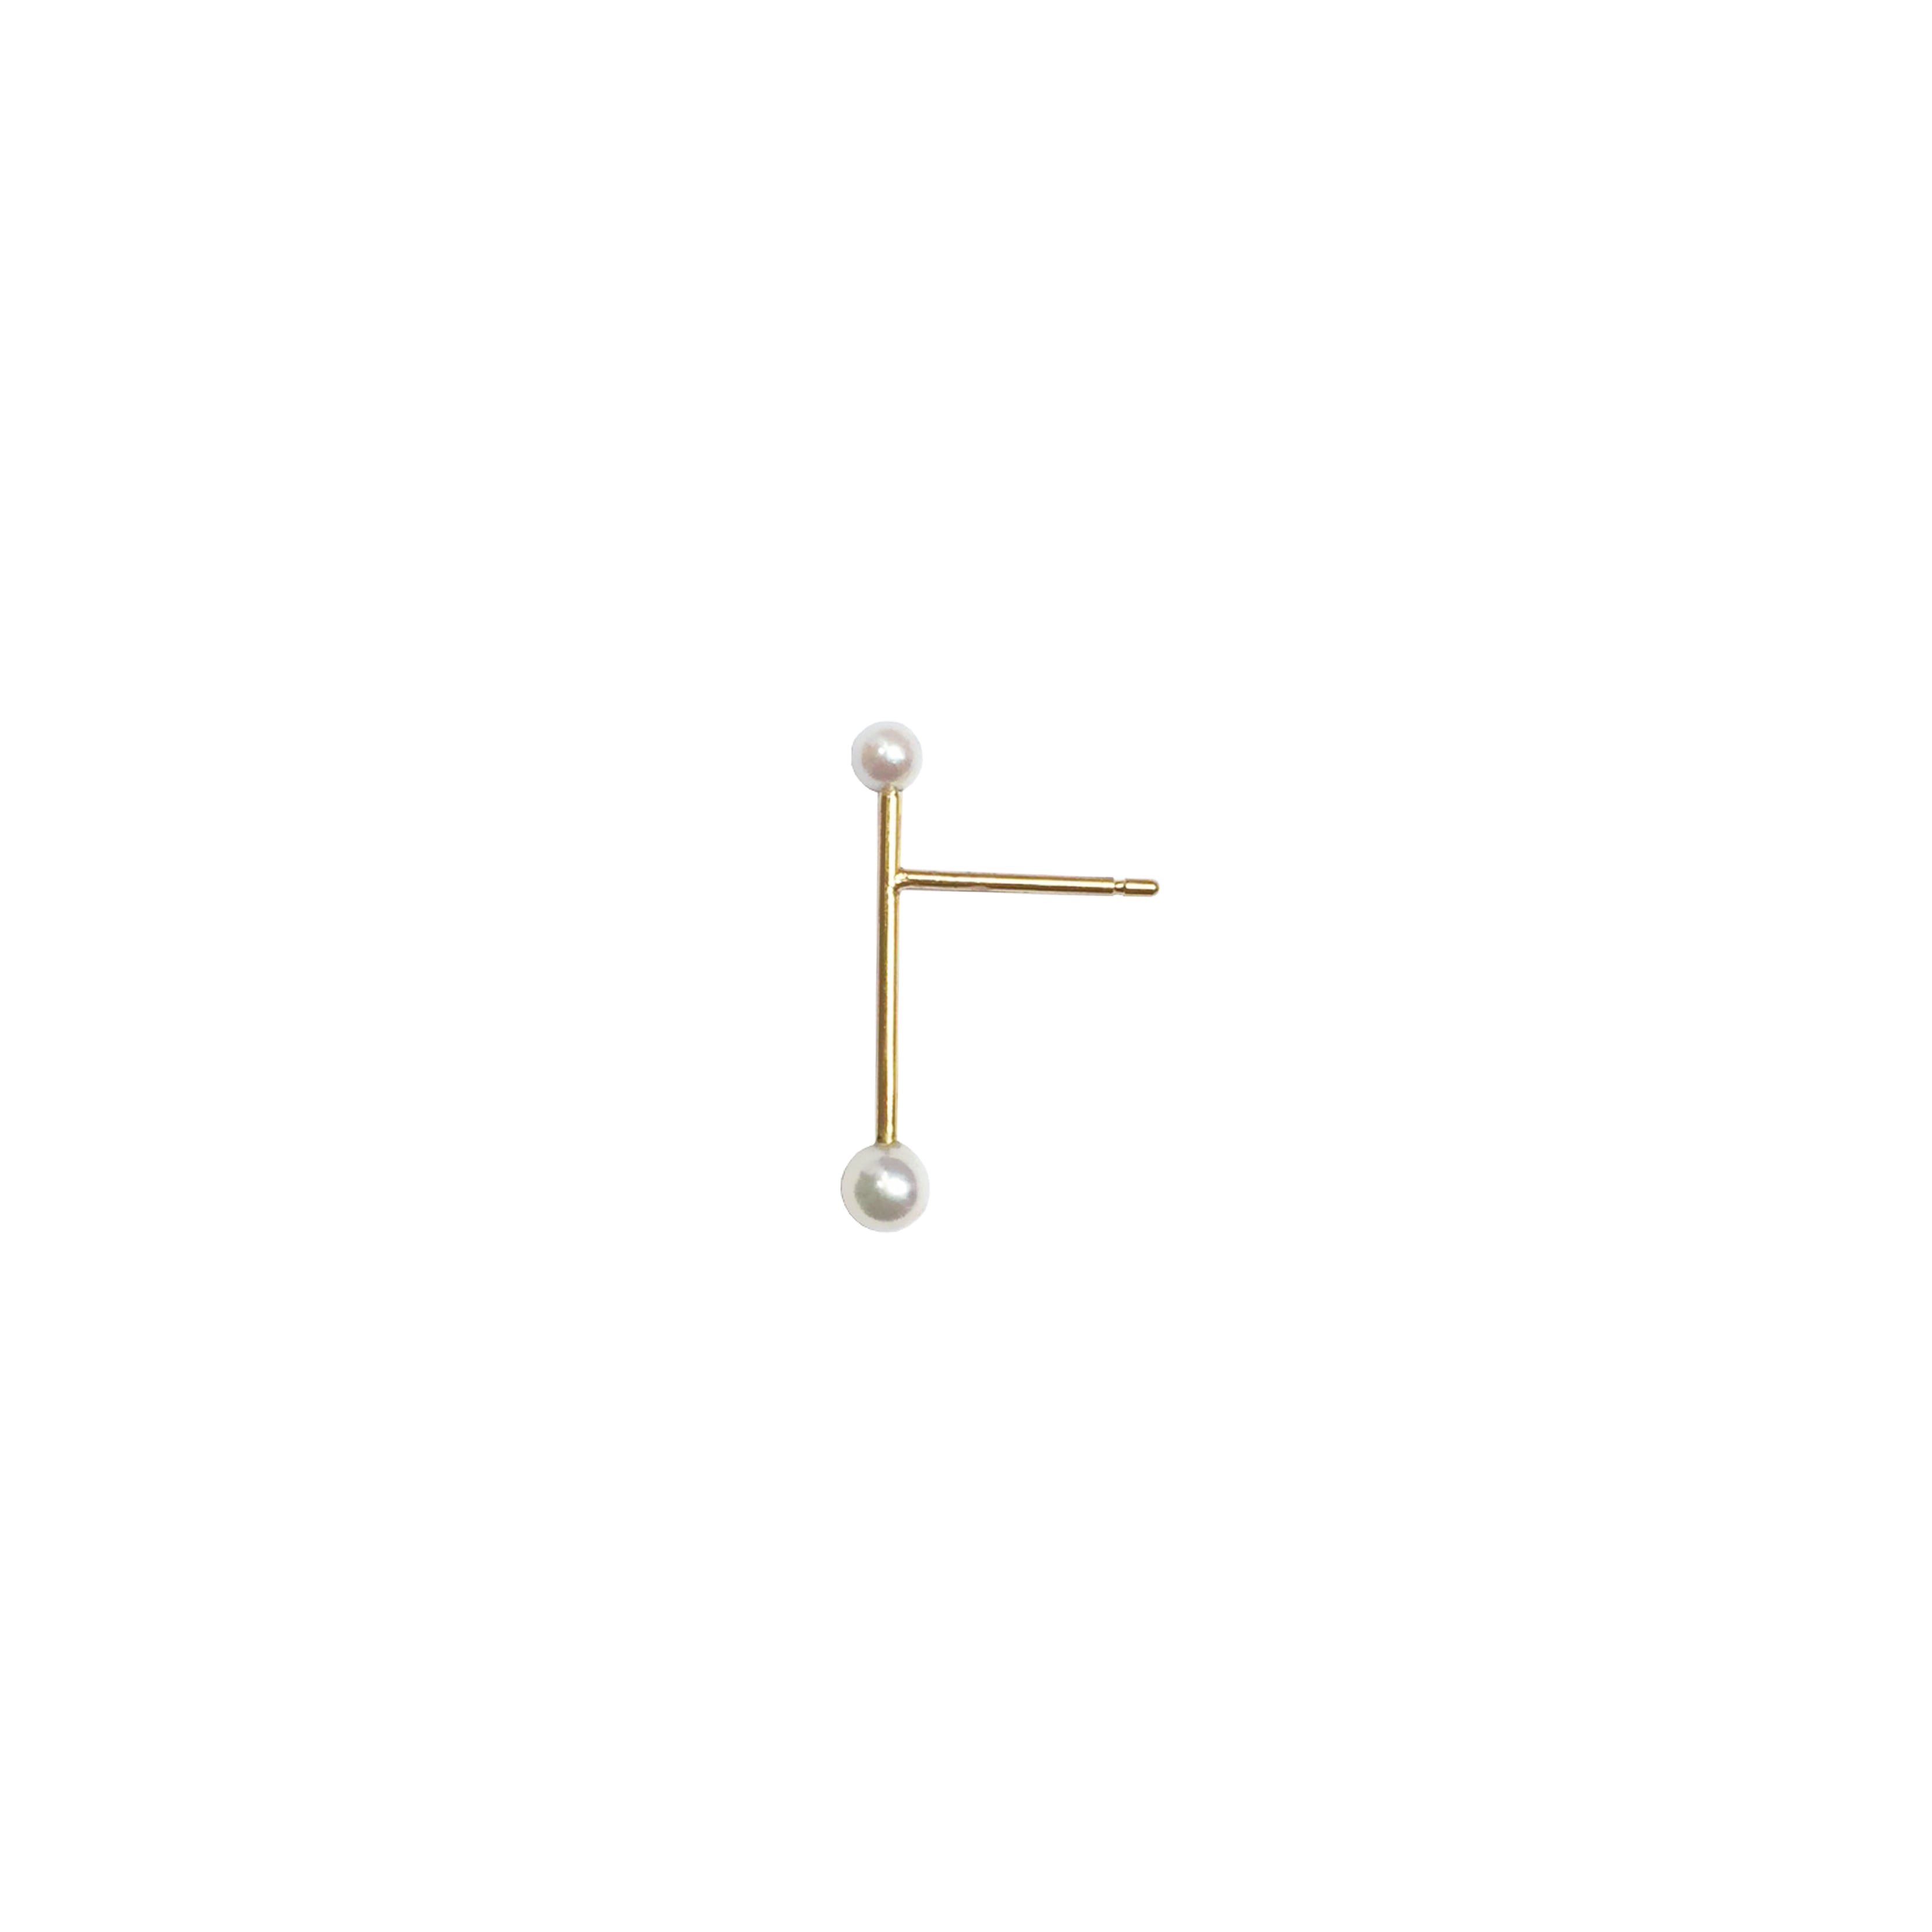 K18 Long Pipe Pierce with Akoya Pearls